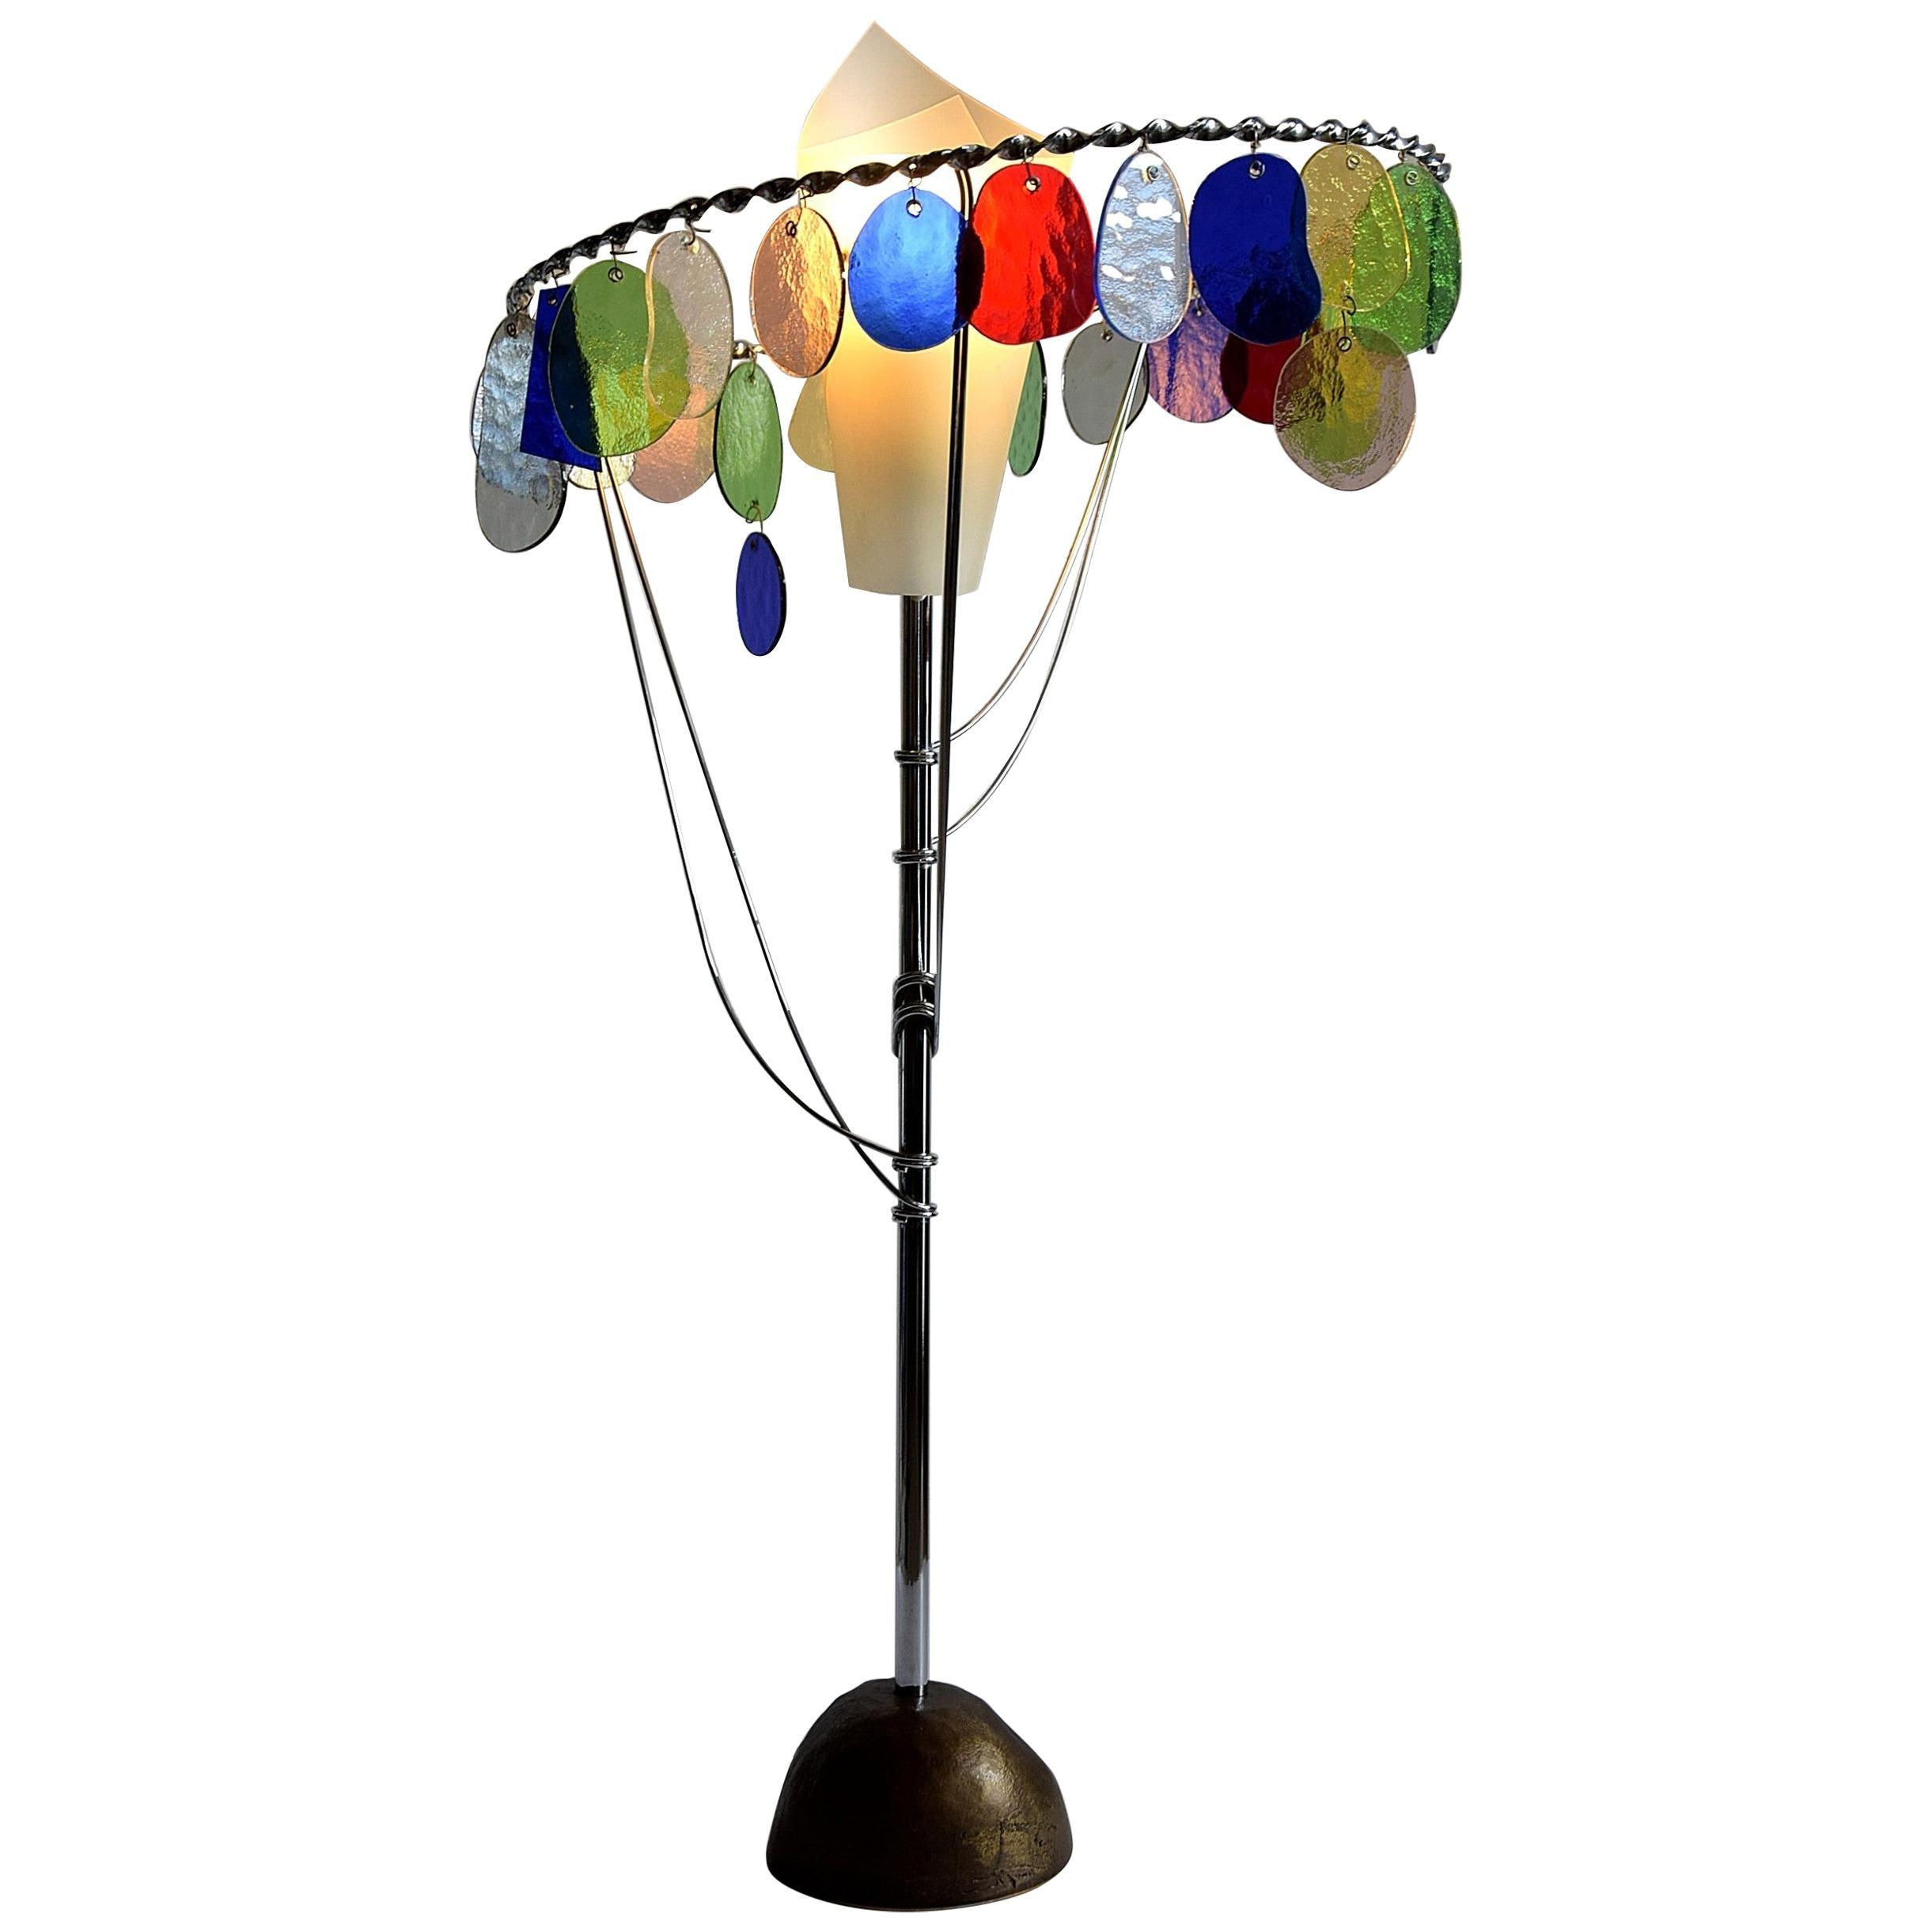 Sibari Table Lamp by Toni Cordero for Artemide